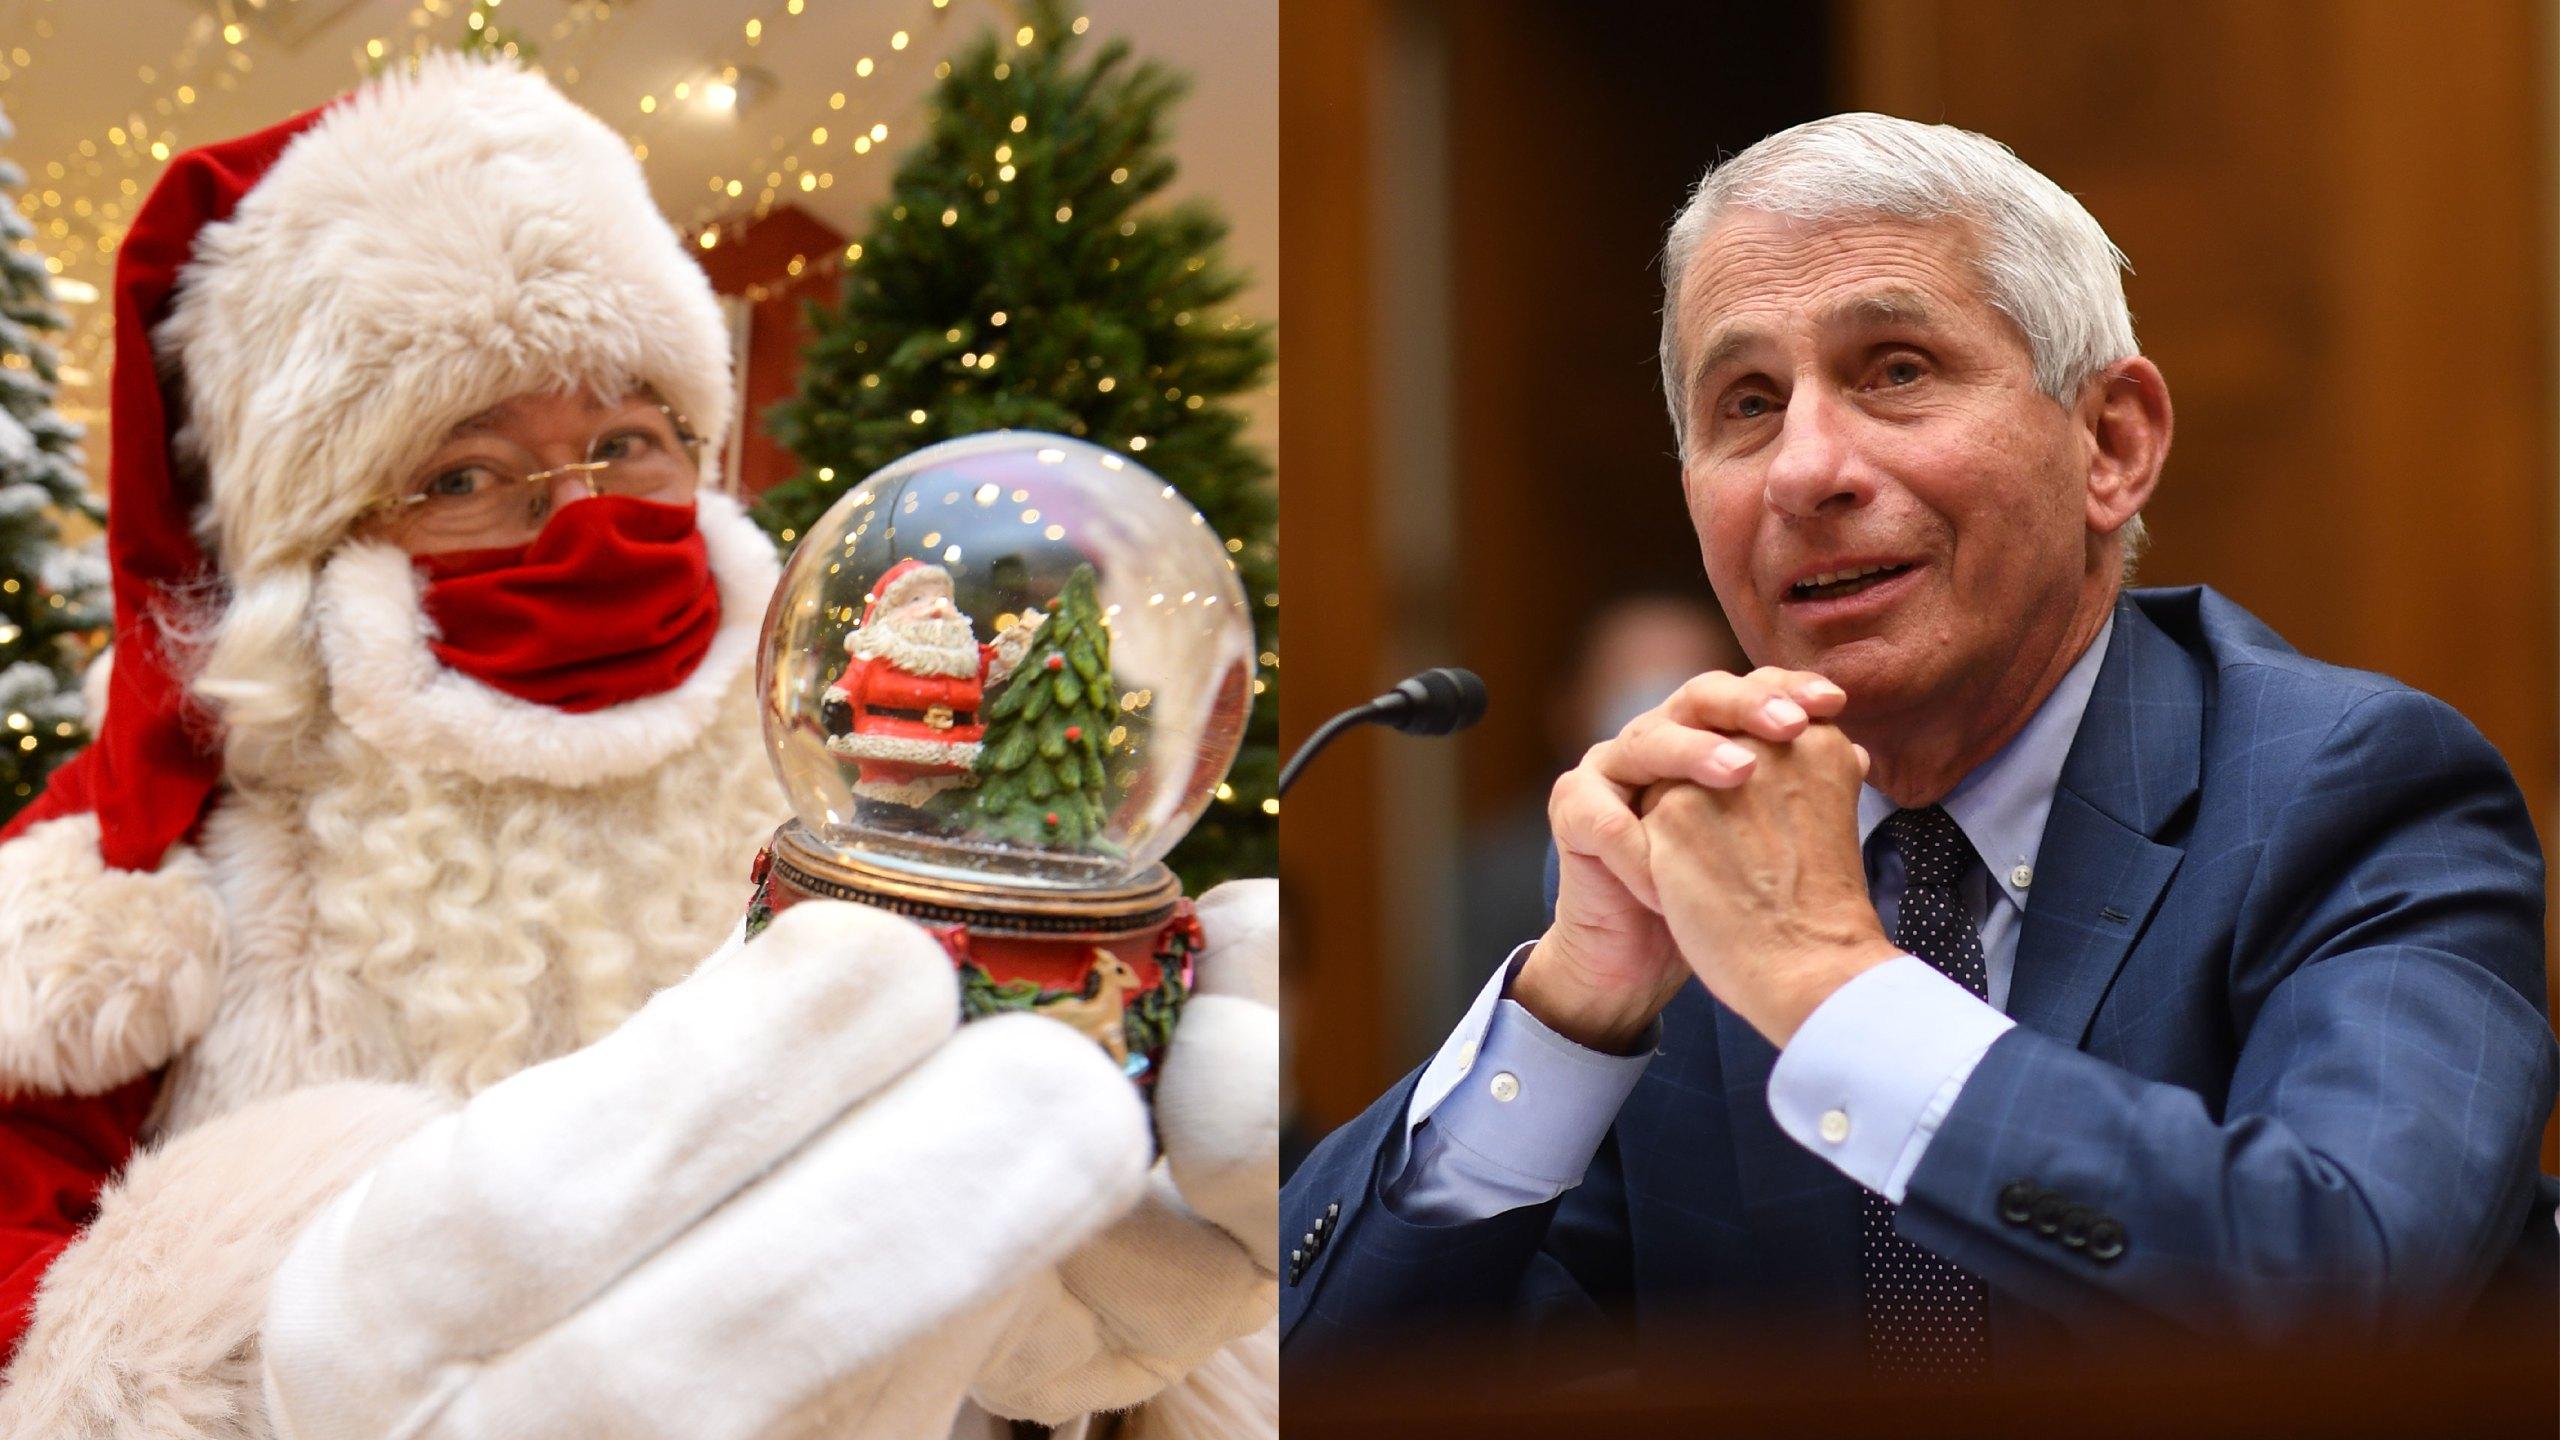 Santa Claus is immune to COVID-19, says Dr. Fauci | KLBK | KAMC |  EverythingLubbock.com